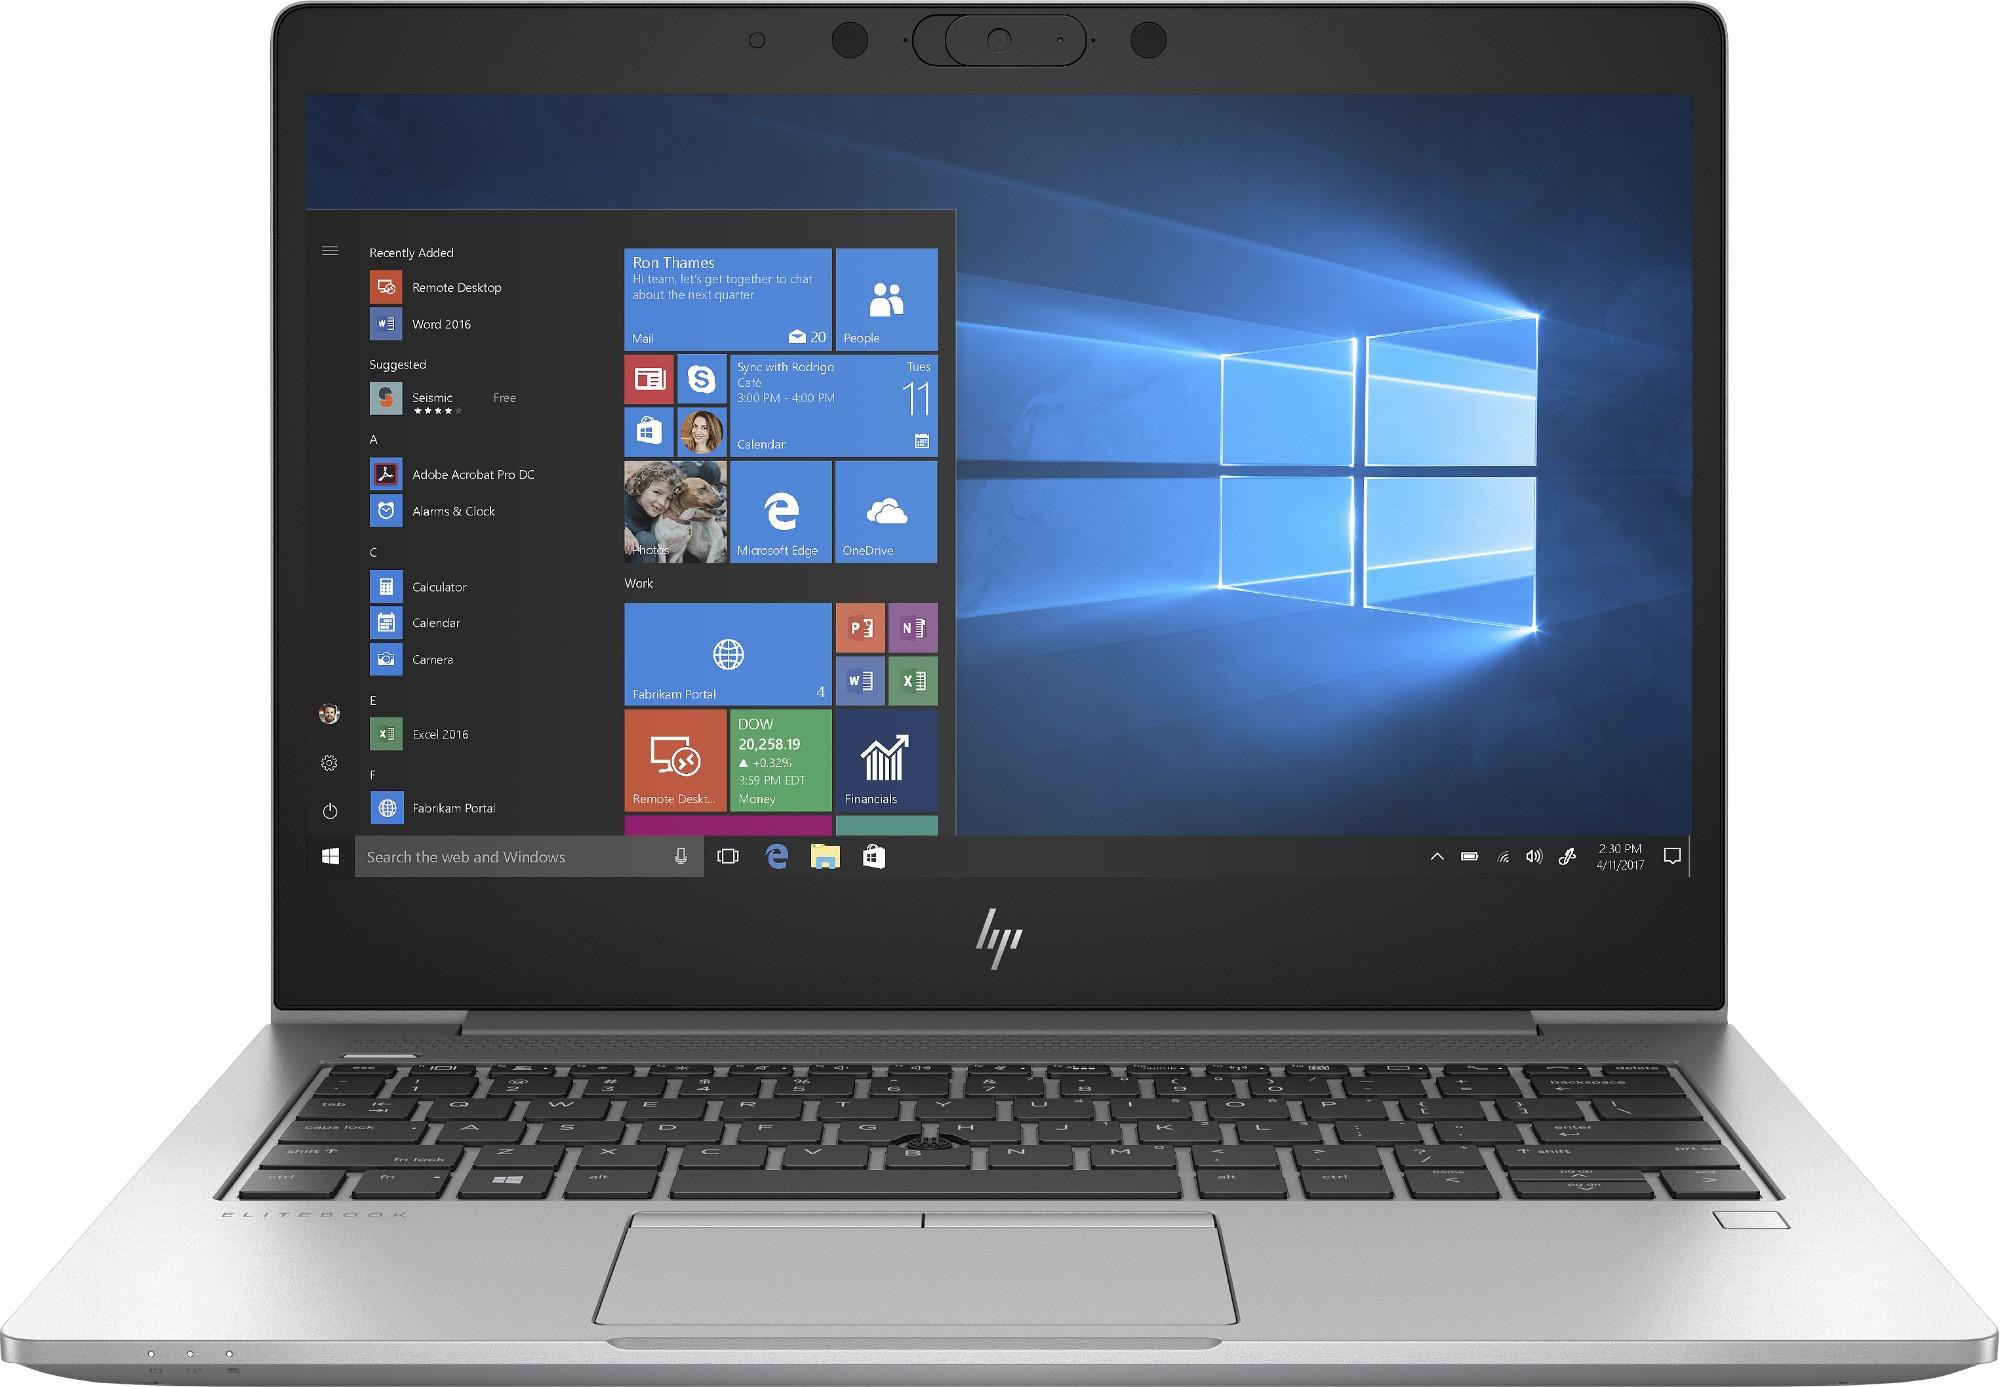 "HP EliteBook 735 G6 Portátil Plata 33,8 cm (13.3"") 1920 x 1080 Pixeles AMD Ryzen 5 PRO 8 GB DDR4-SDRAM 256 GB SSD Wi-Fi 6 (802.11ax) Windows 10 Pro"